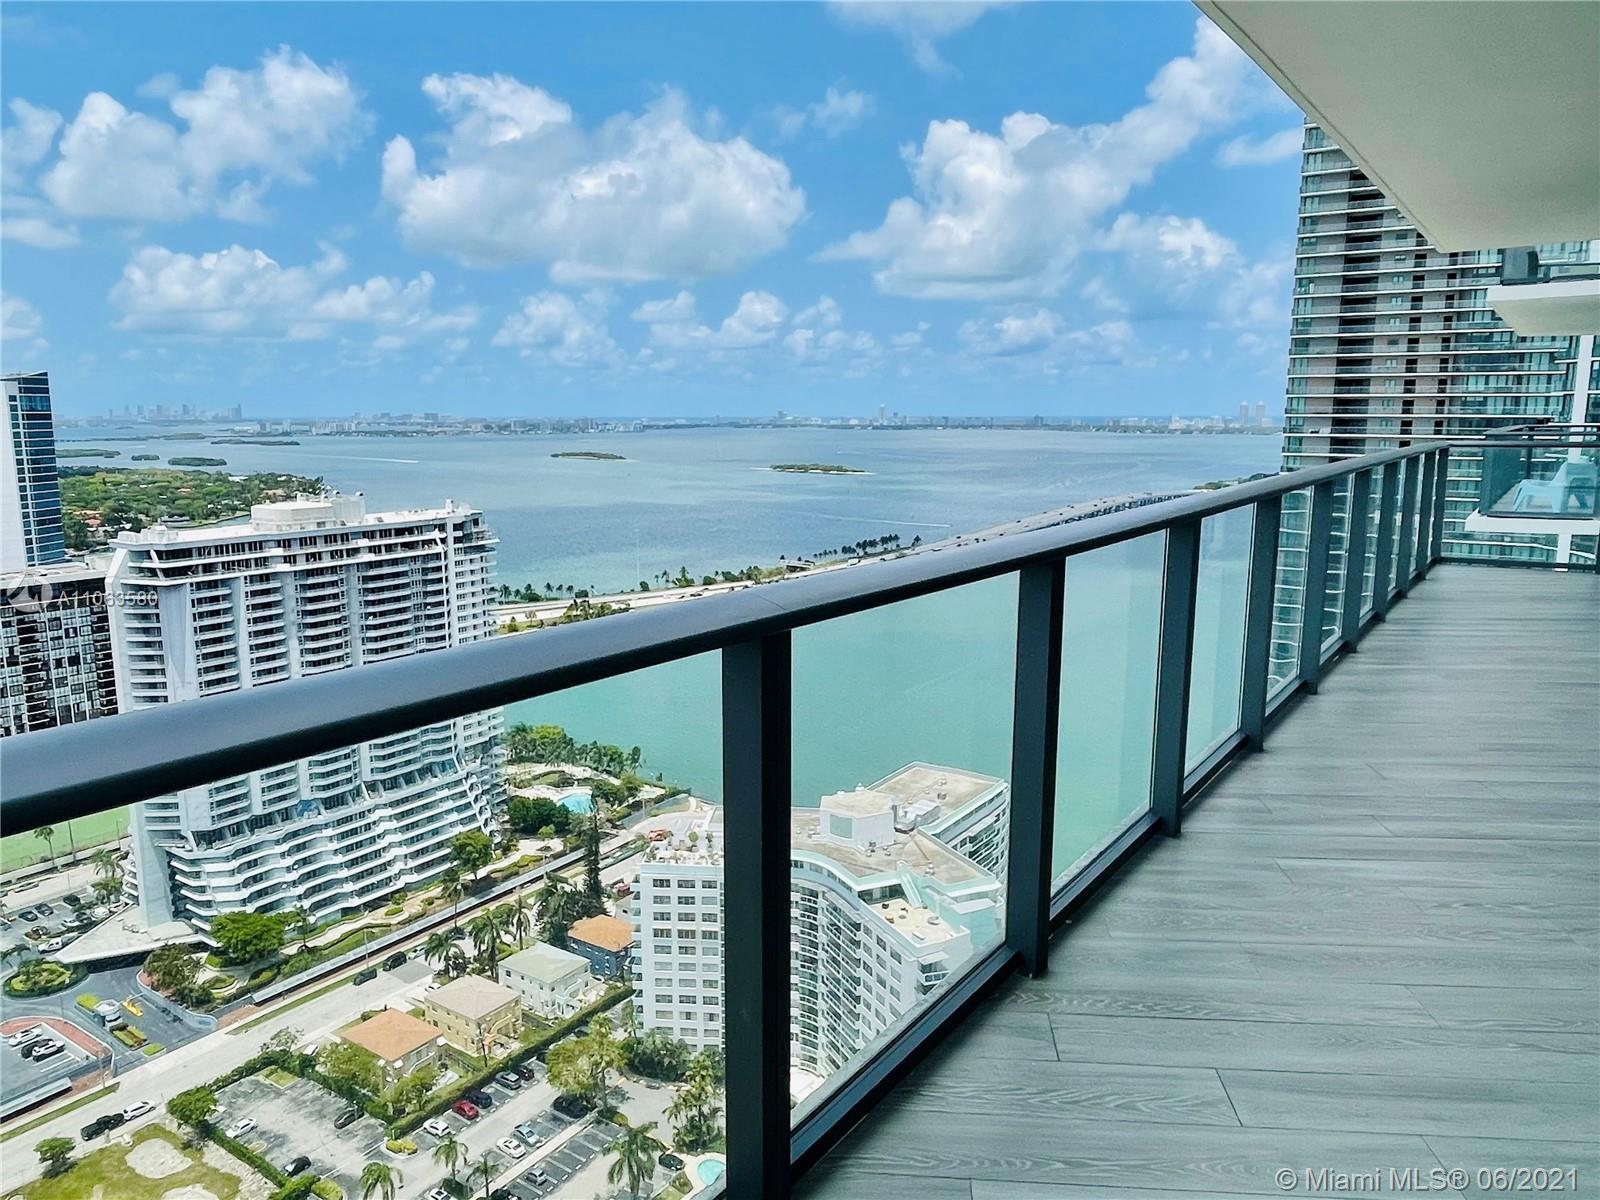 One of a kind condo in Paraiso Bayviews. BAY  and Miami skyline views from the wraparound balcony.